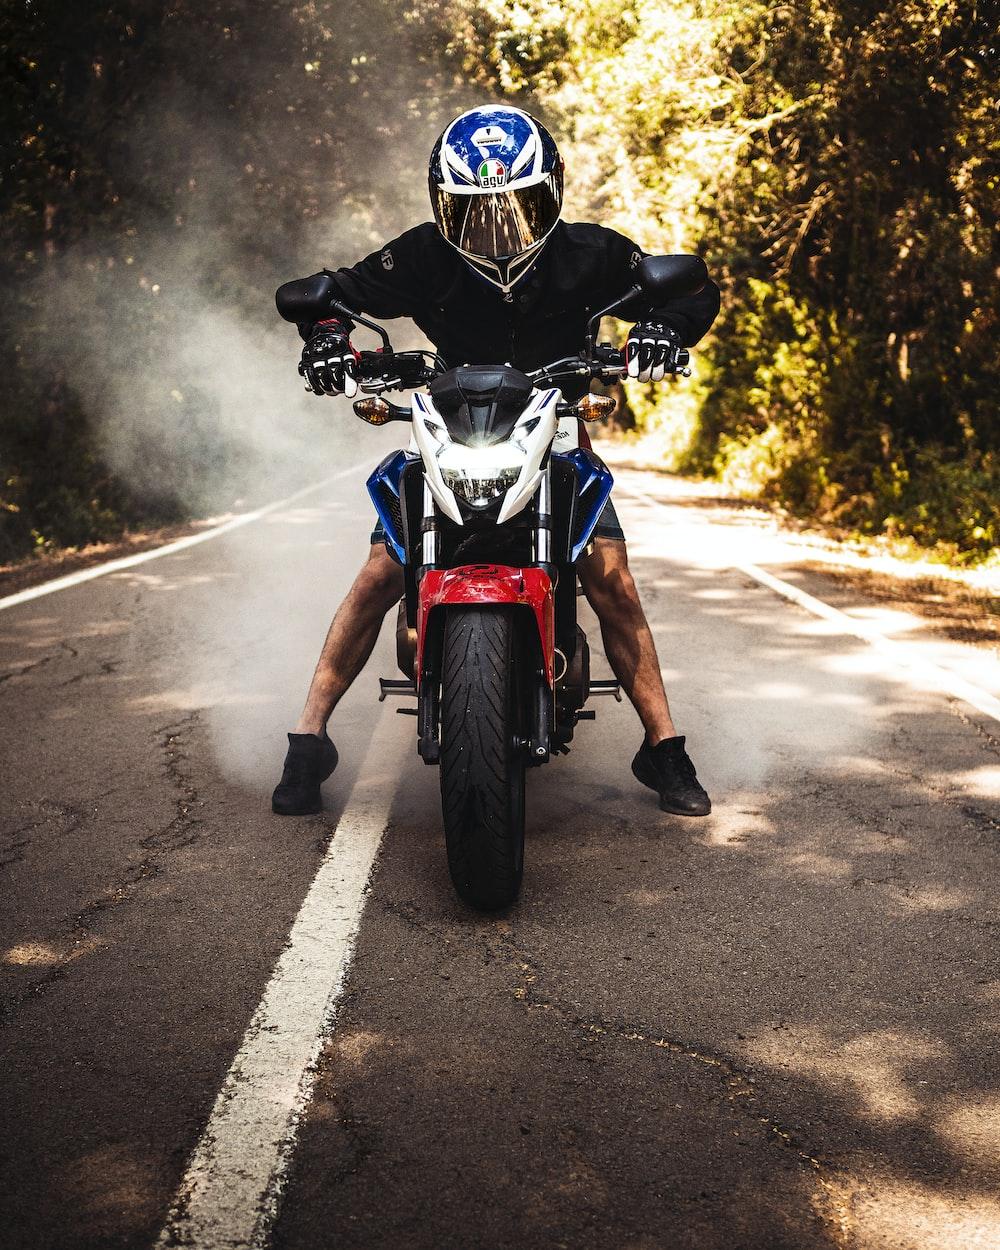 man riding on motorcycle near tree